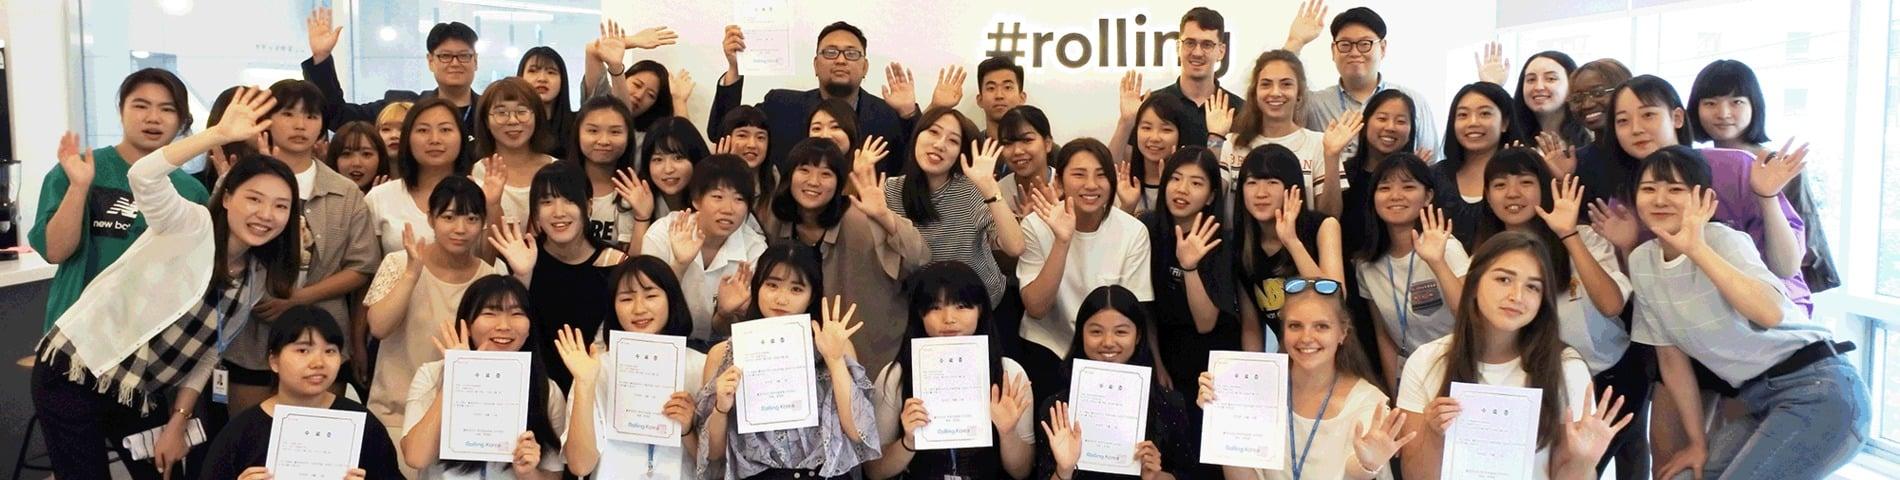 Rolling Korea picture 1